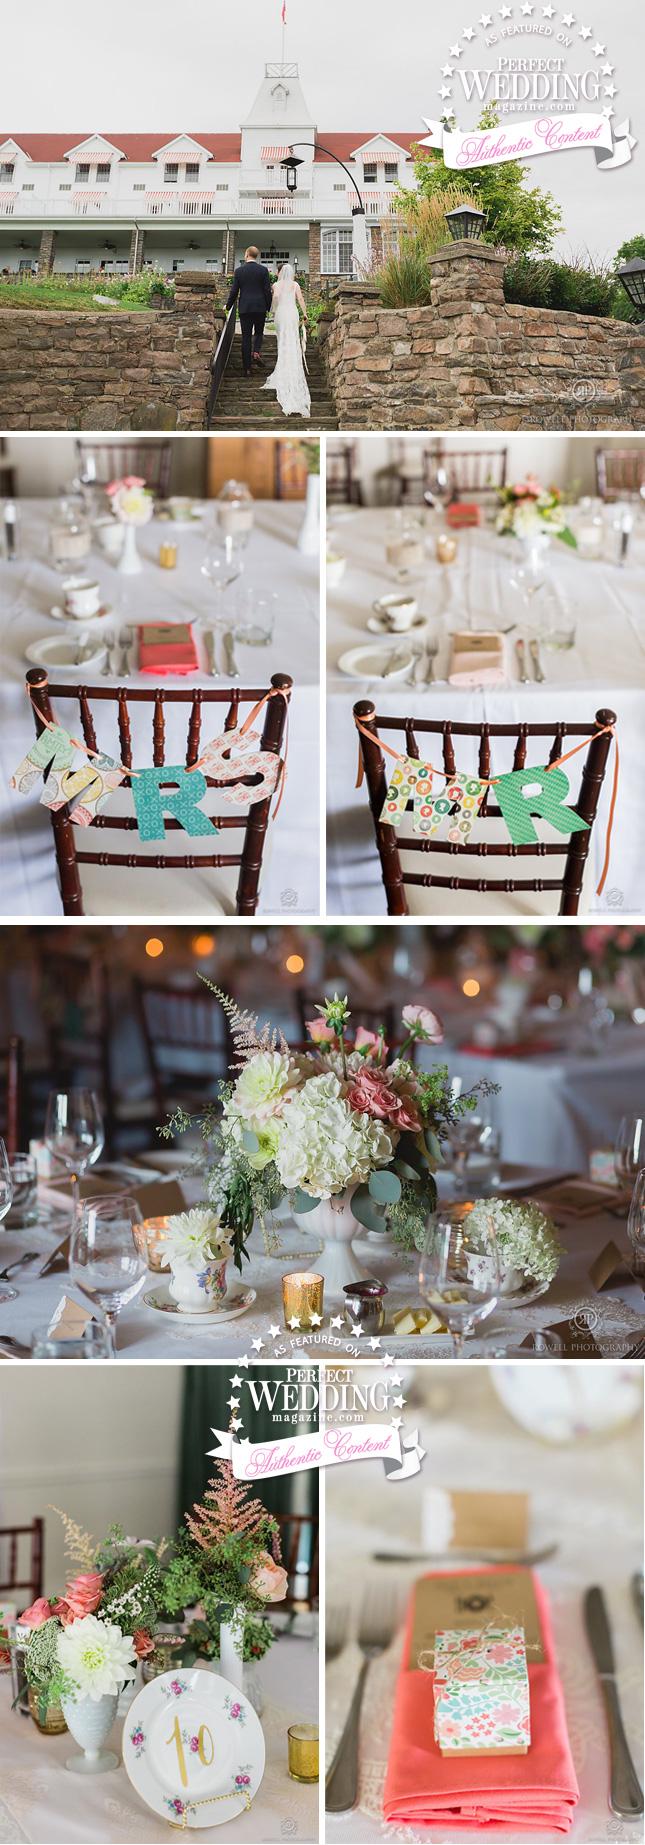 Canadian Summer Weddings, Summer weddings, Muskoka Weddings, SUMMER WEDDING MUSKOKA, Photo, Cottage Wedding, Wedding Decor, Bridal Flowers, Perfect Wedding Magazine, Perfect Wedding Blog